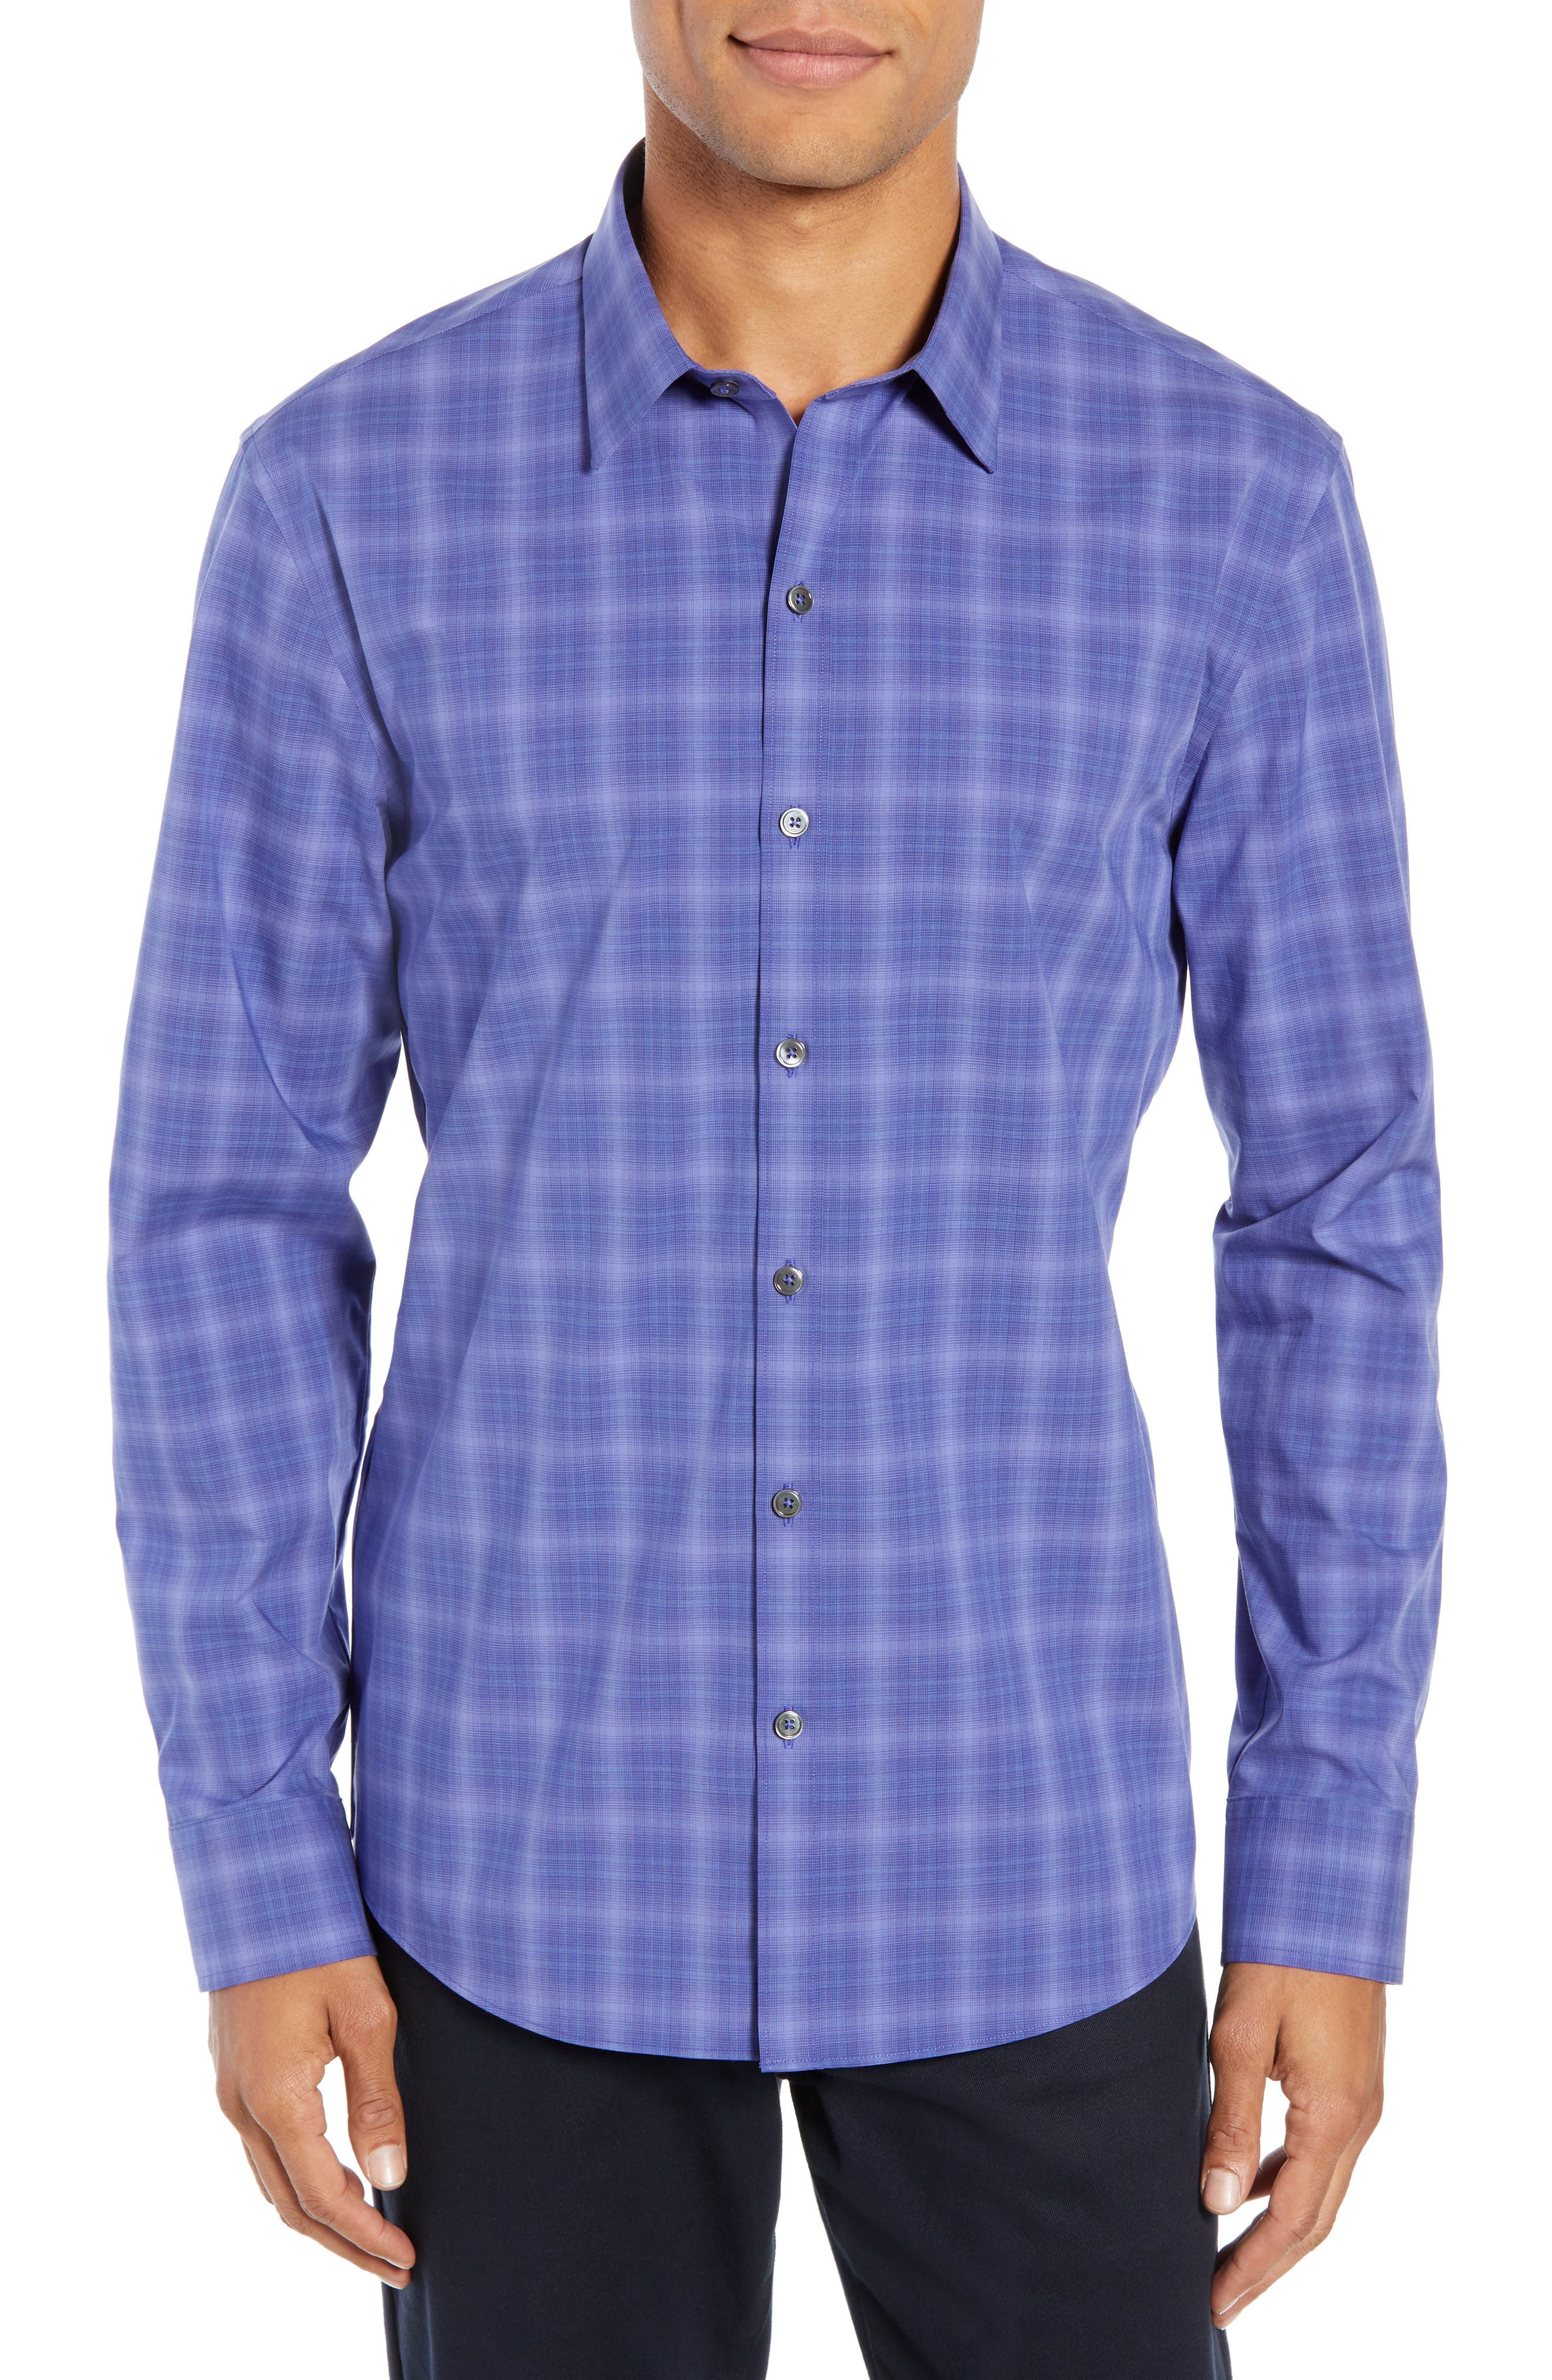 ZACHARY PRELL, Wandy Regular Fit Check Sport Shirt, Main thumbnail 1, color, LIGHT PURPLE